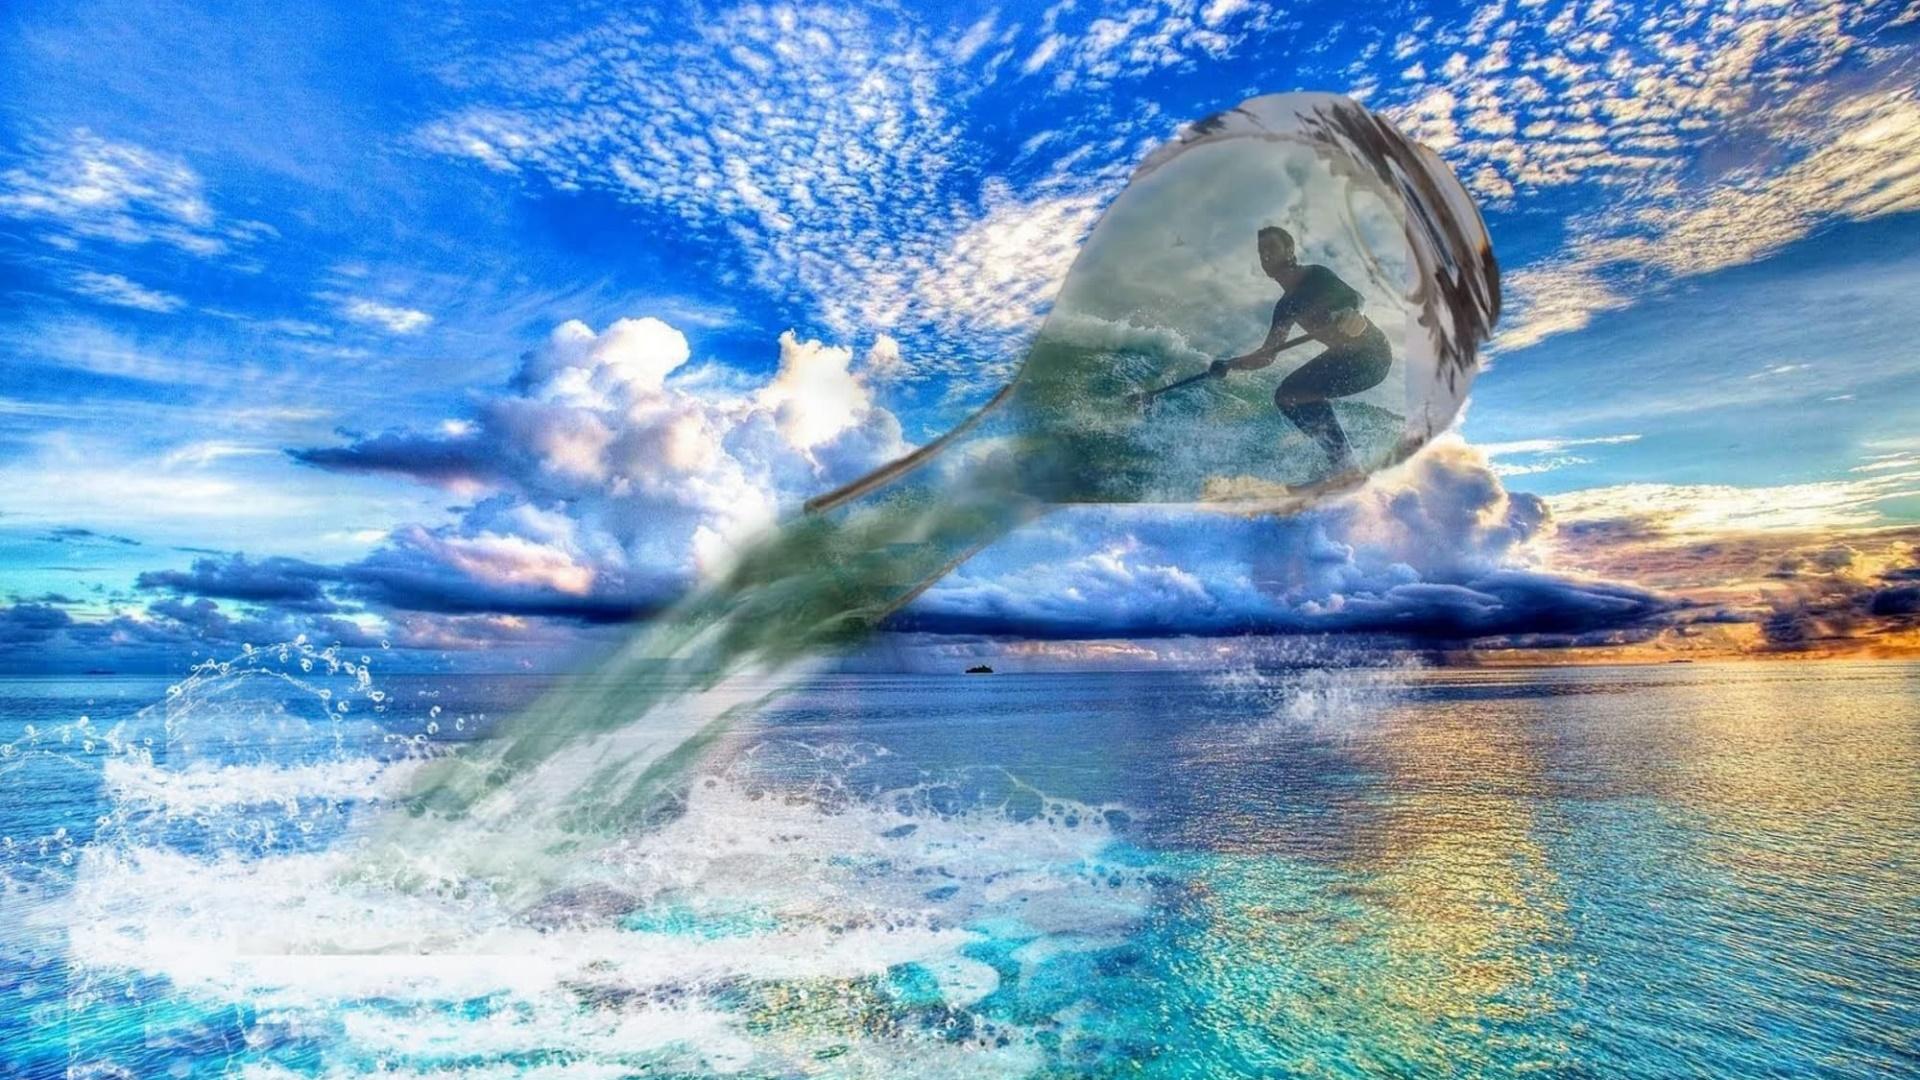 Surfer selfie wallpaper